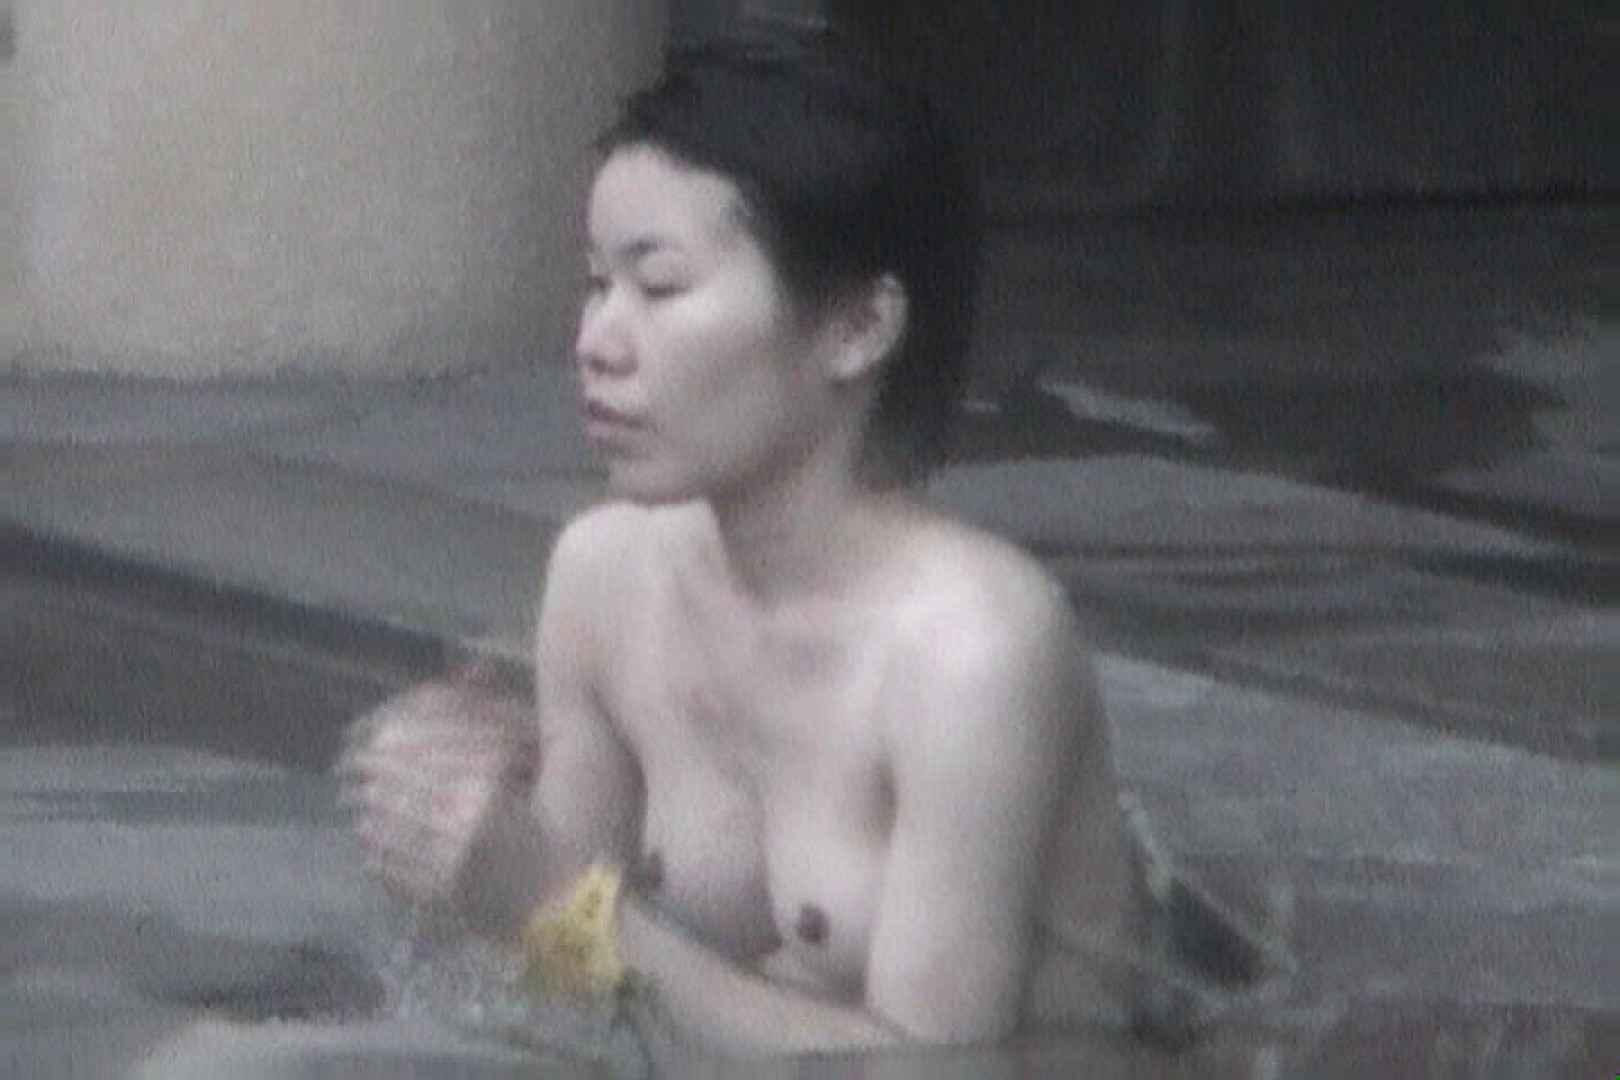 Aquaな露天風呂Vol.556 露天風呂編 | 盗撮シリーズ  99PIX 73